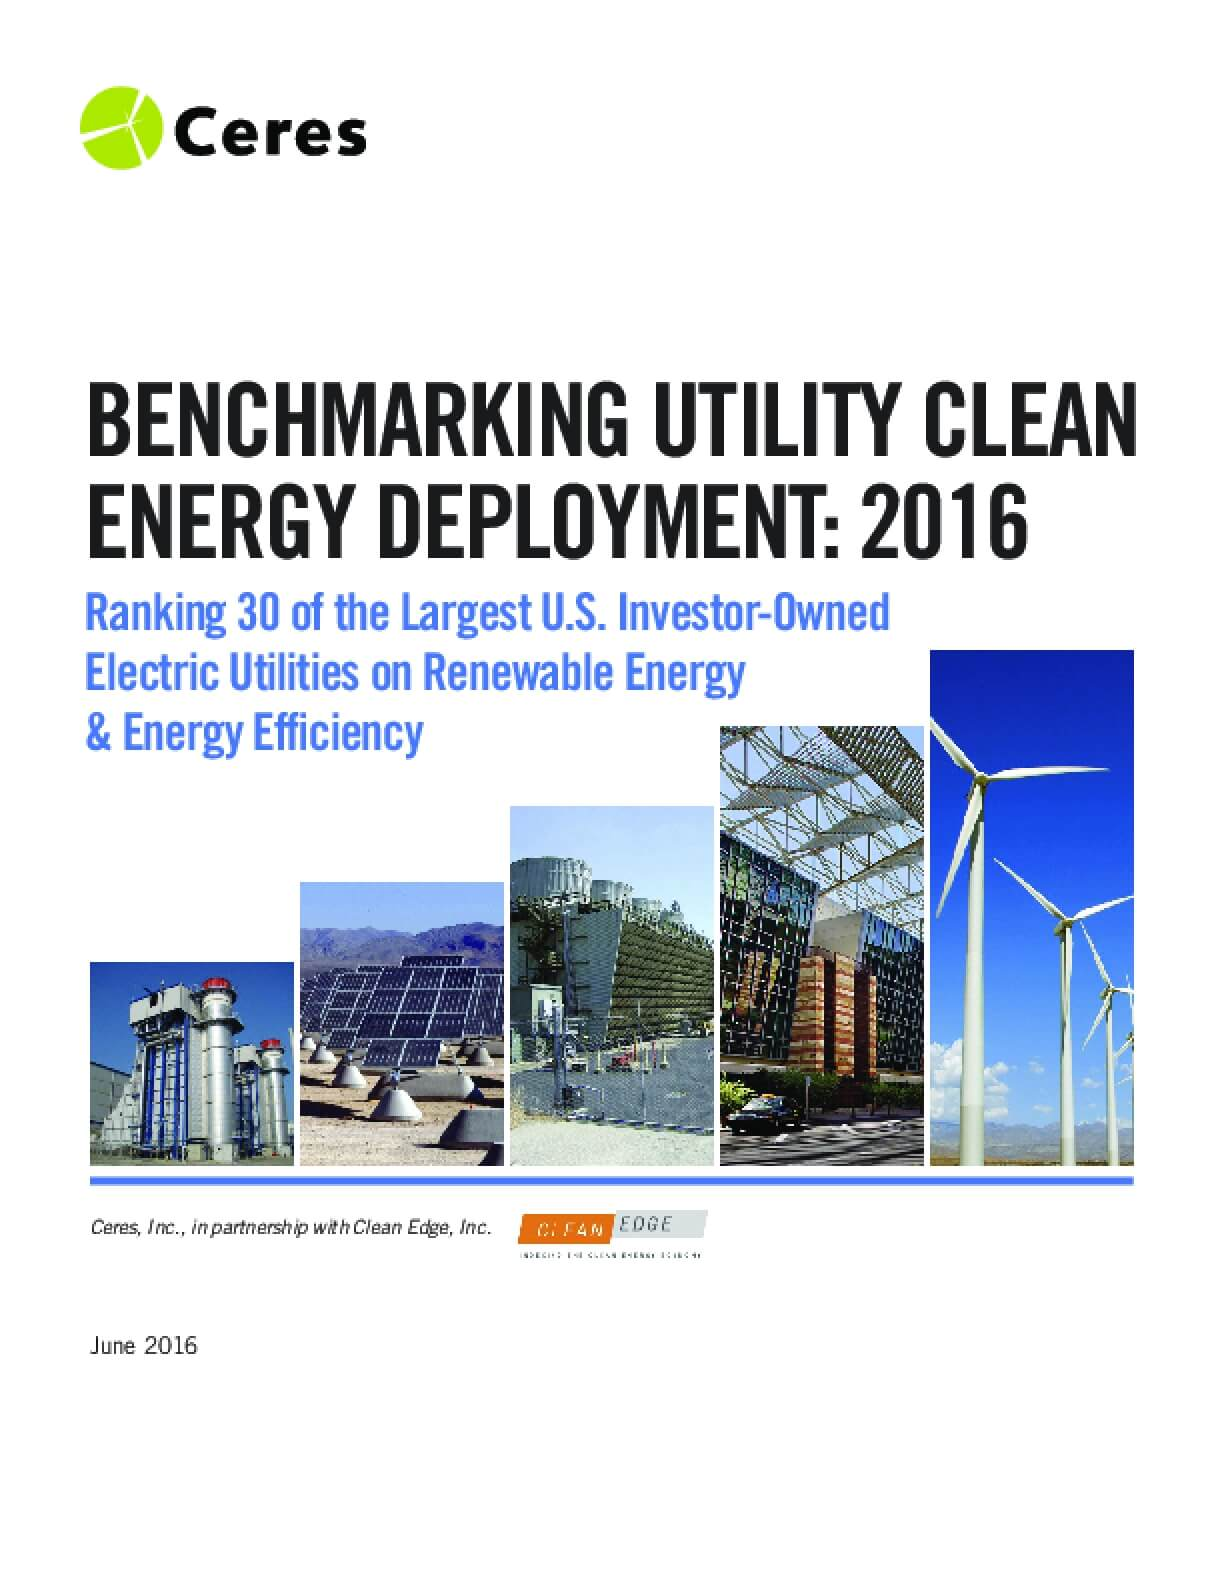 Benchmarking Utility Clean Energy Deployment: 2016